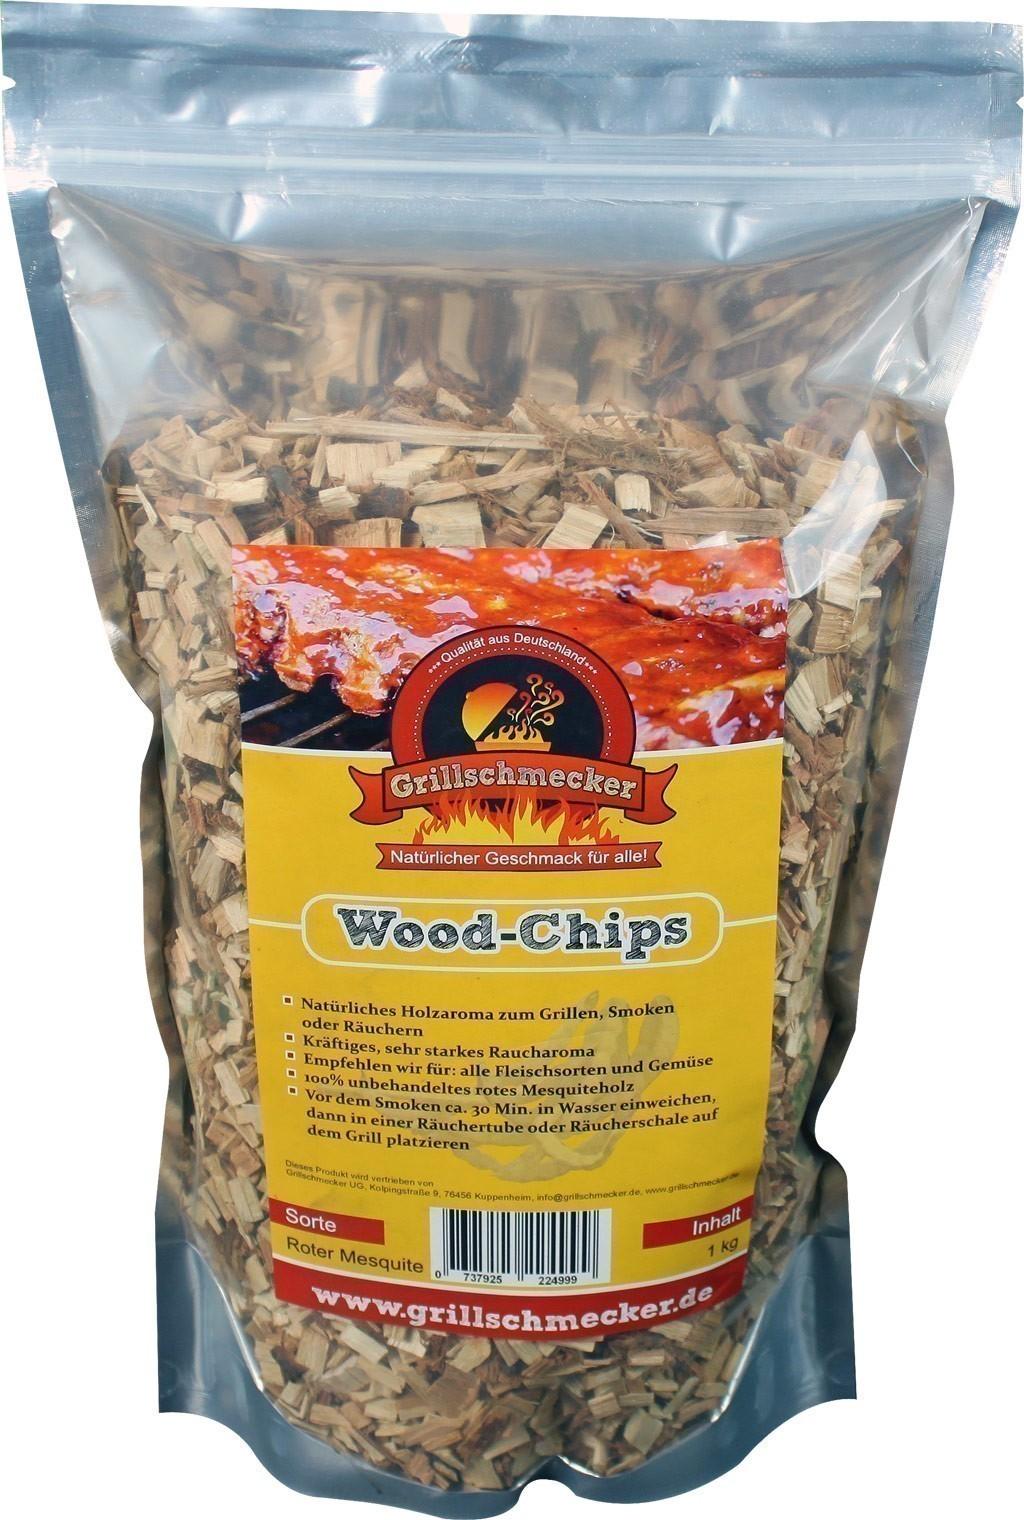 Räucherholz Wood-Chips roter Mesquite 1kg Bild 1